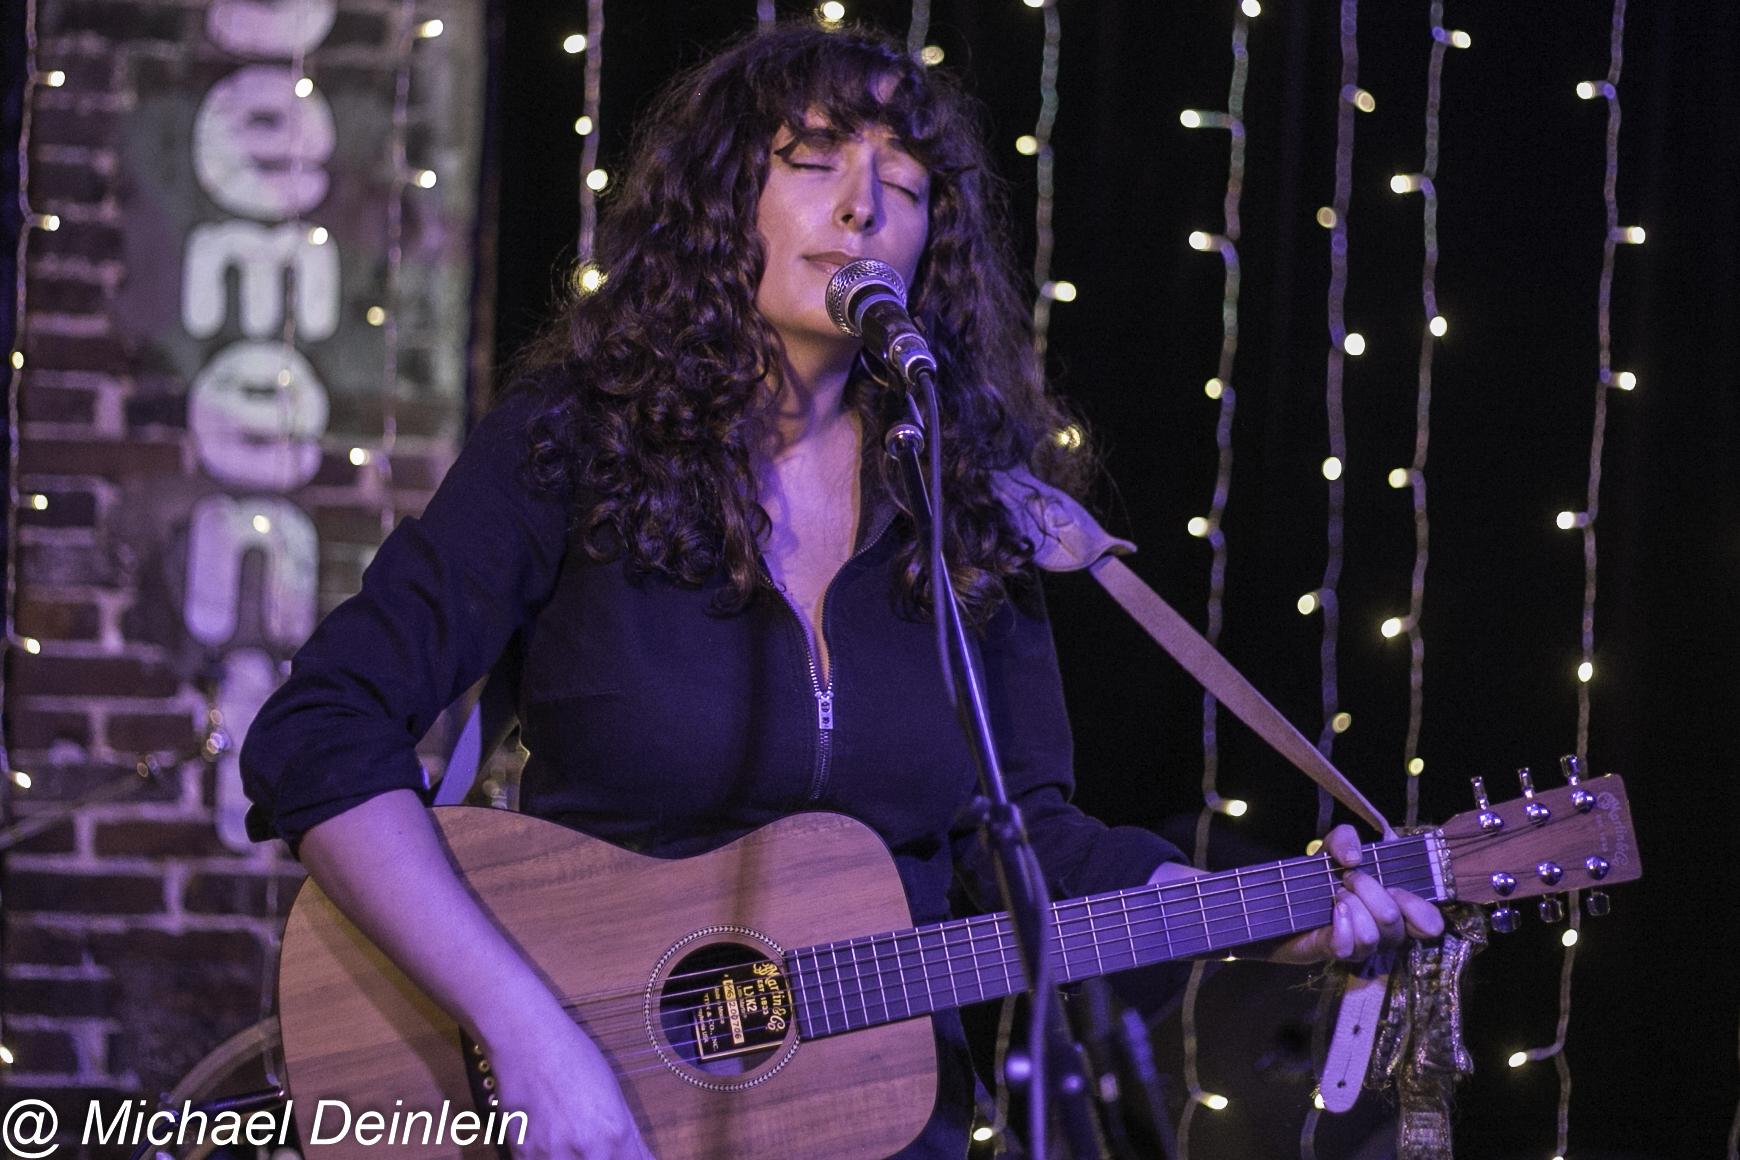 Rosi Golan  @ The Basement in Nashville, TN | Photo by Michael Deinlein